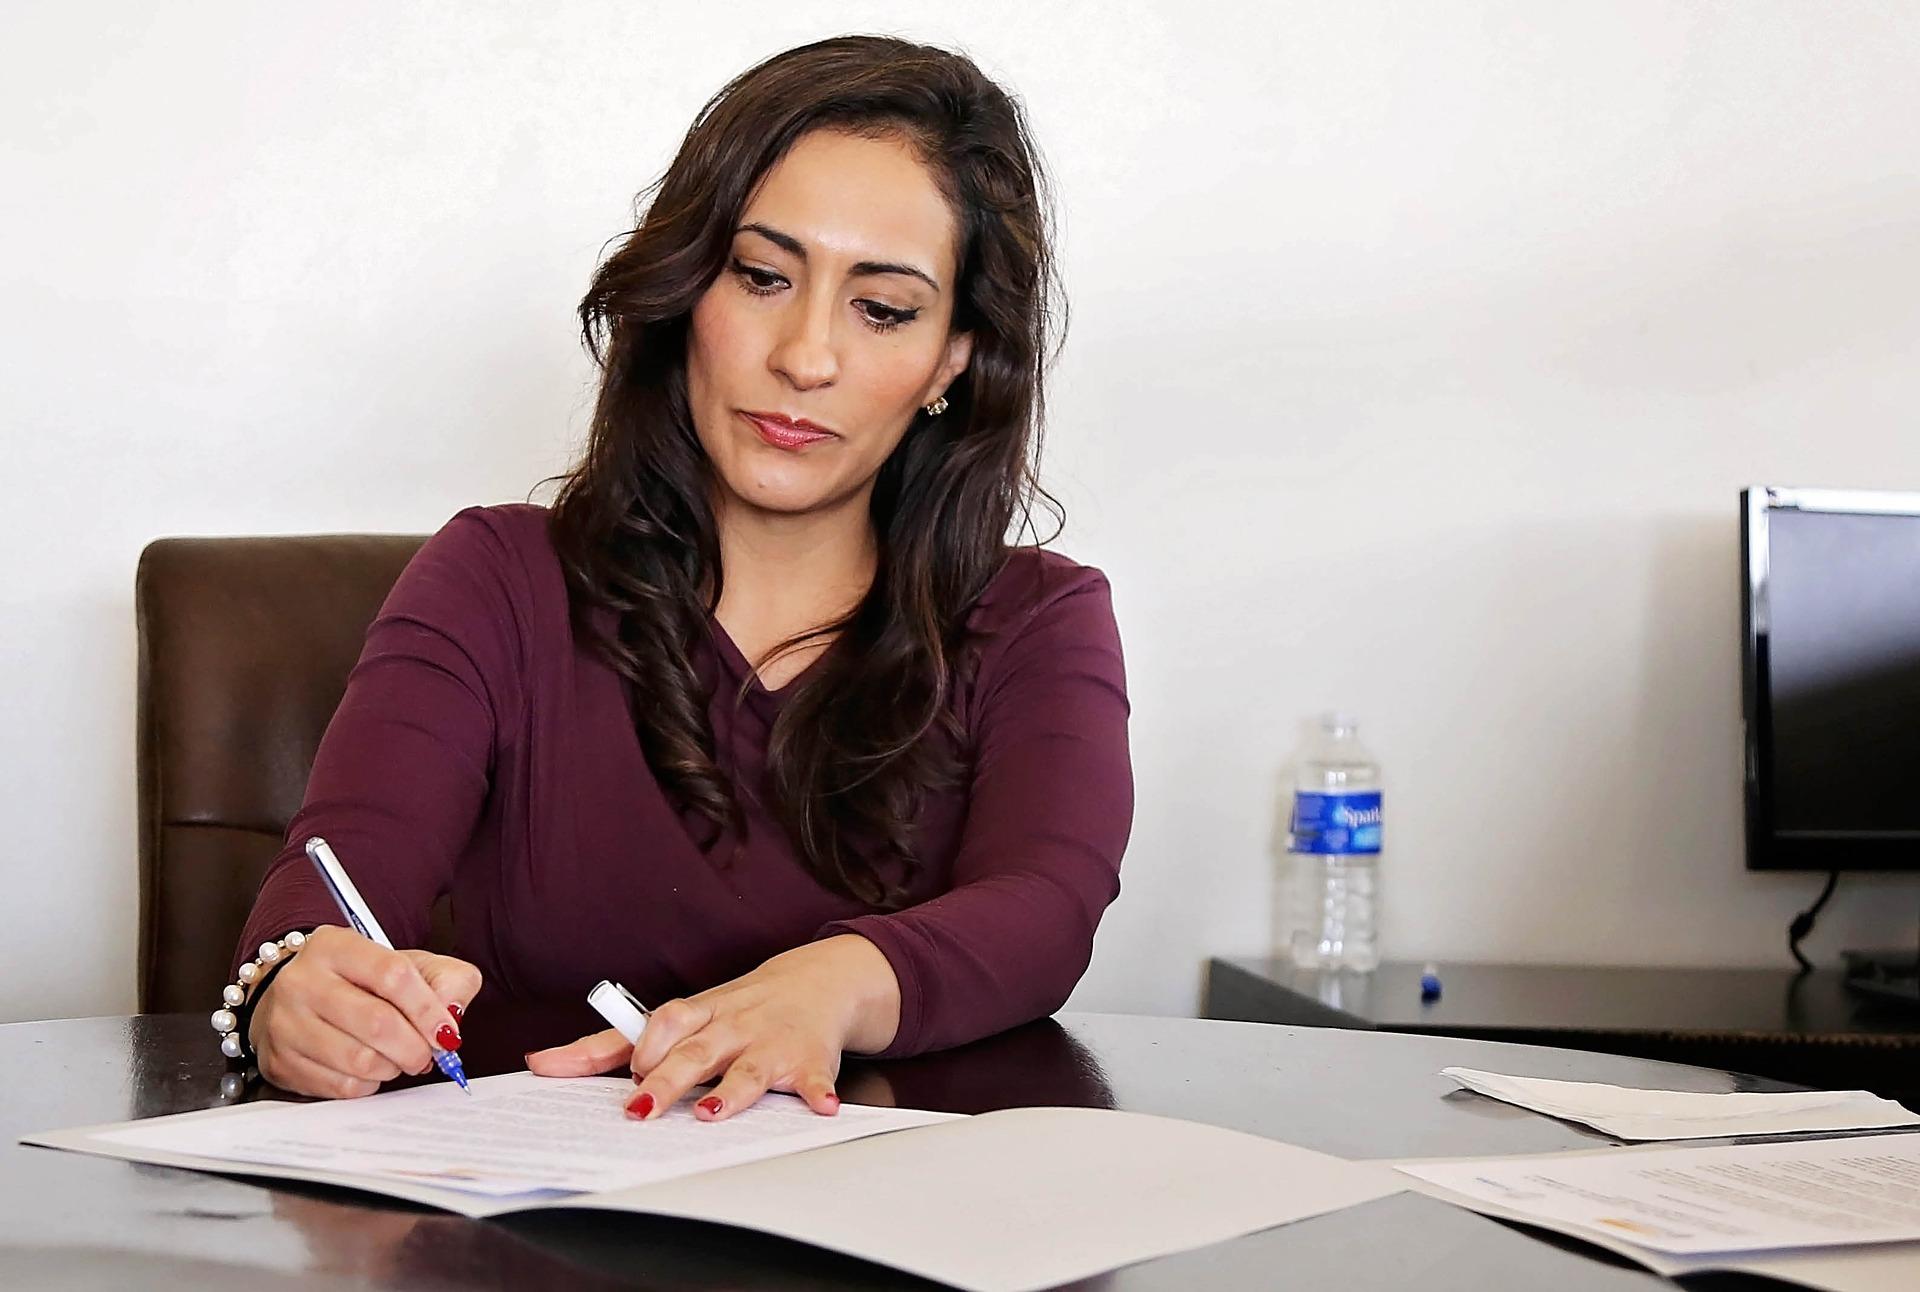 Work during the Menopause Years II